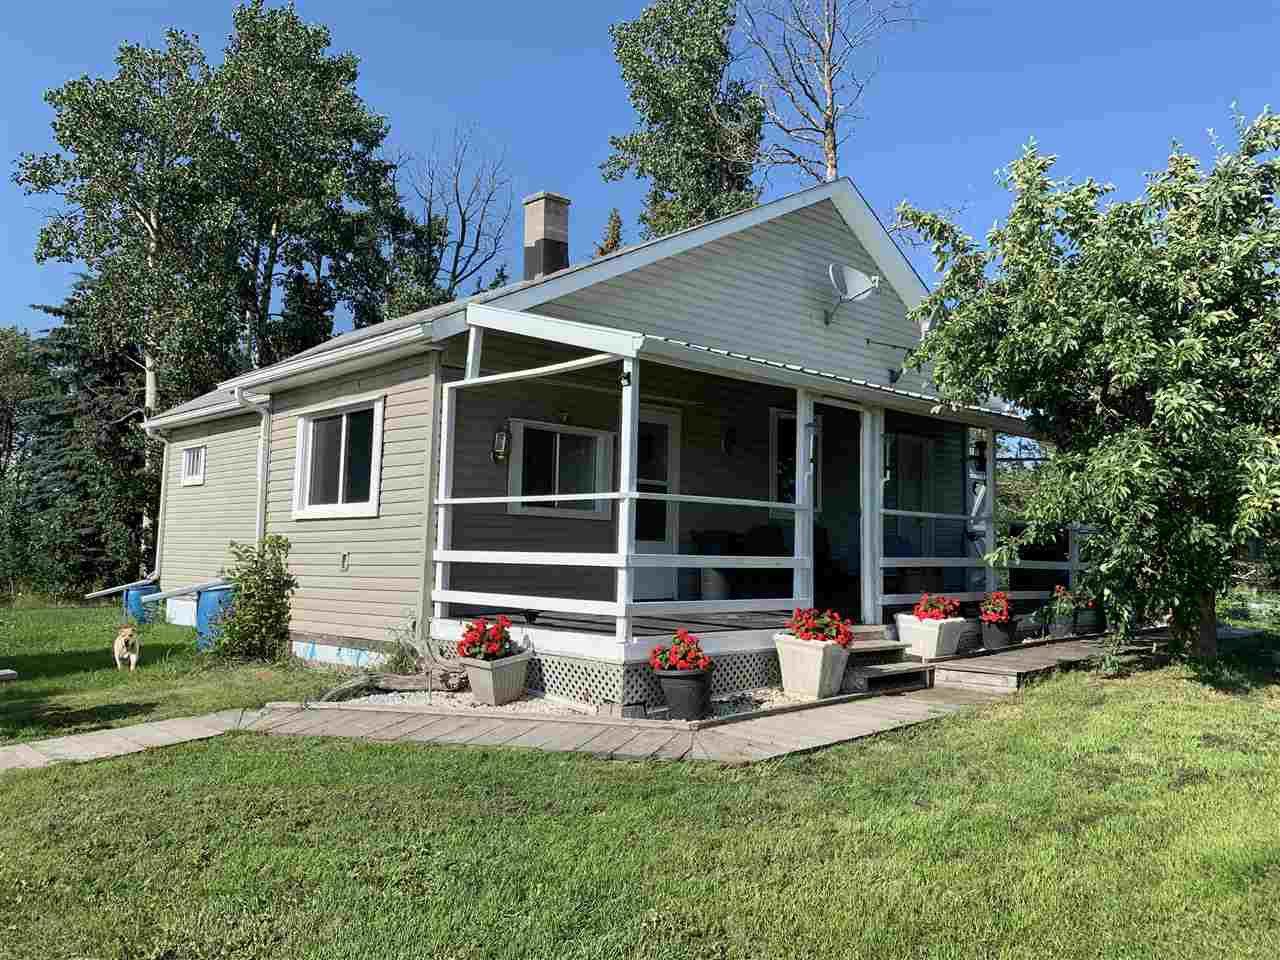 Main Photo: 1519 TWP RD 584: Rural Barrhead County House for sale : MLS®# E4167343